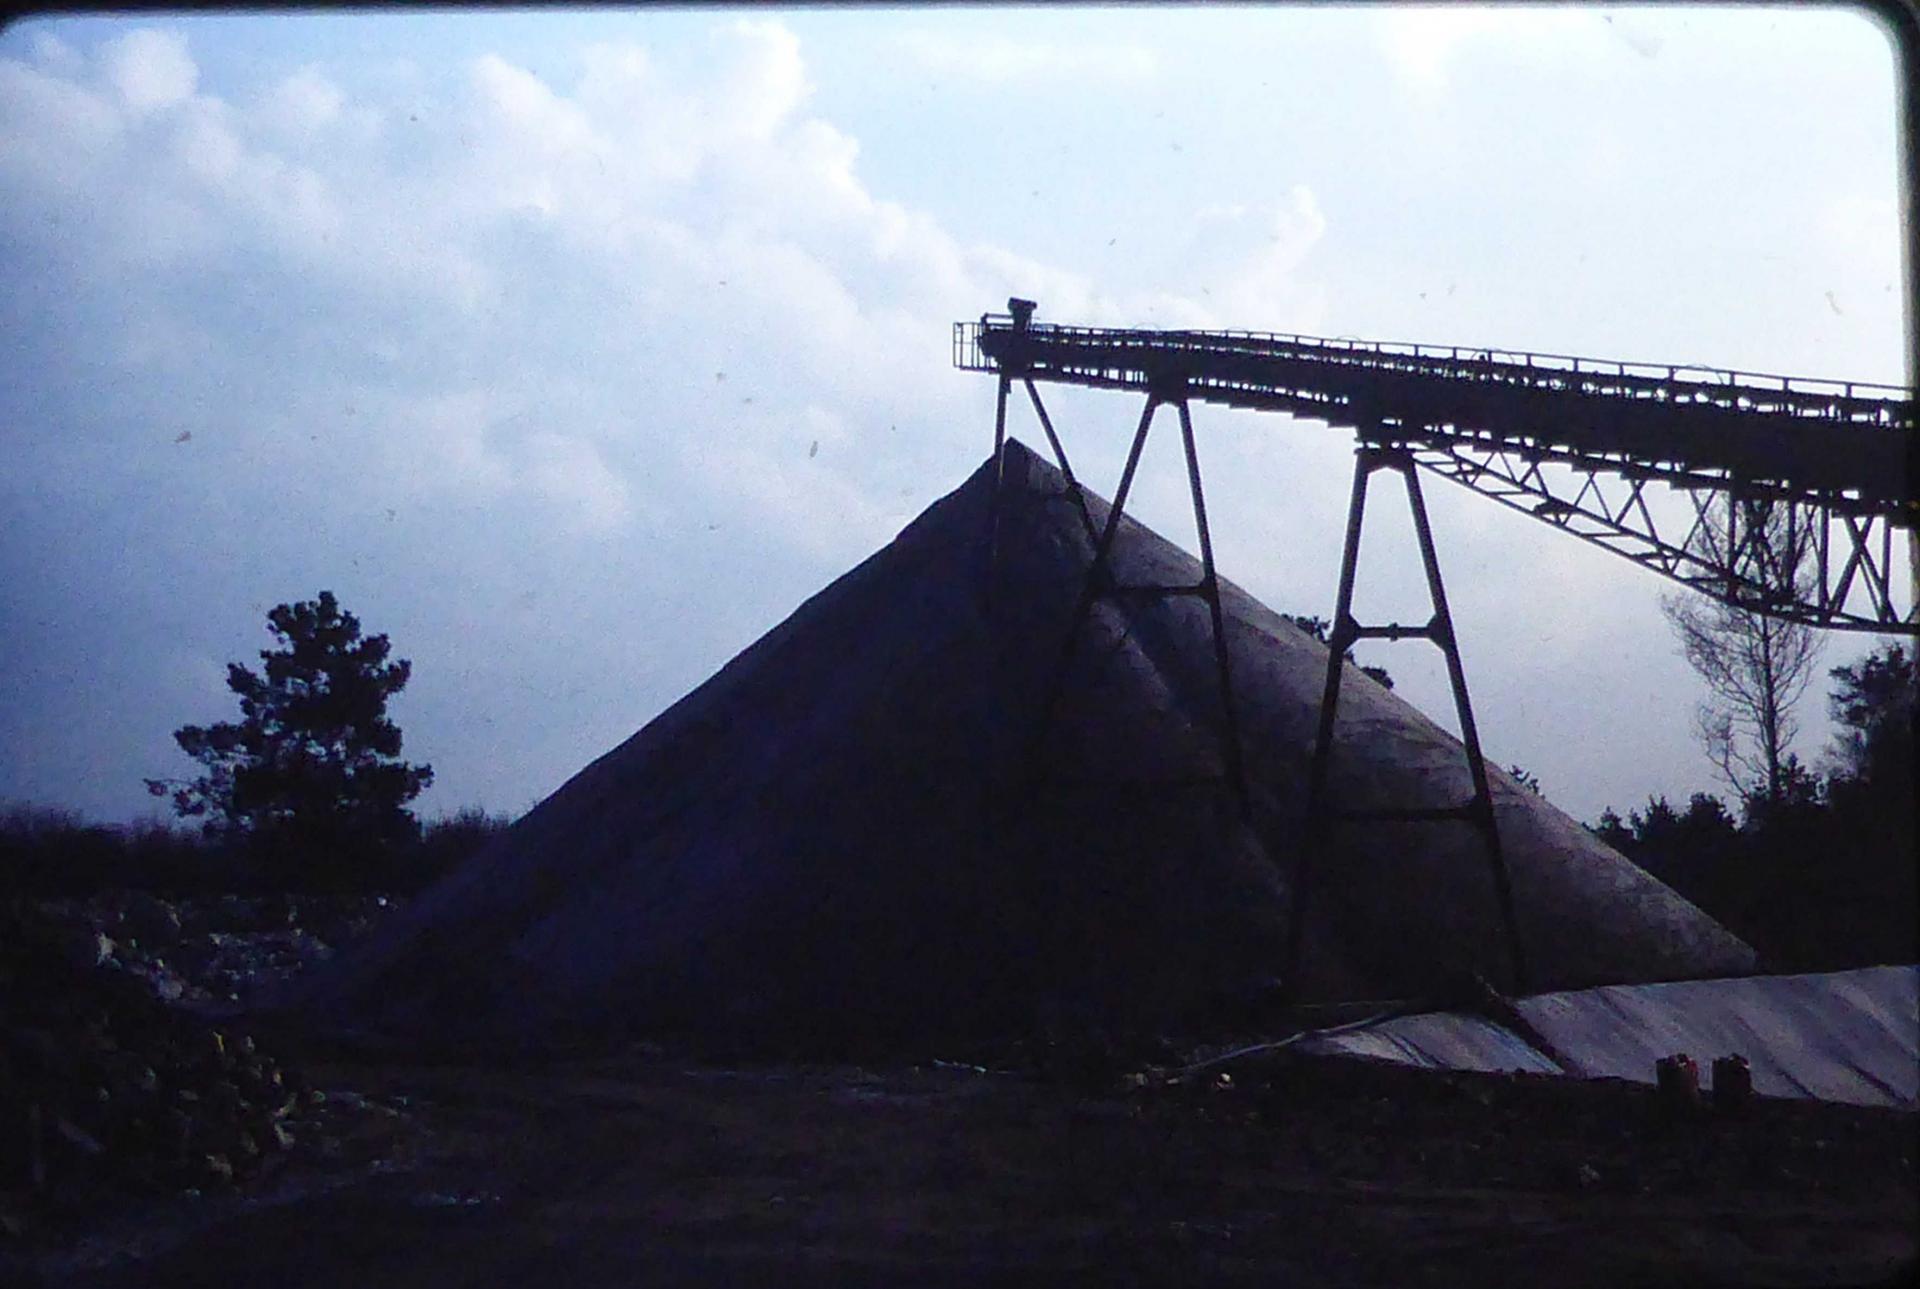 07 1977 a 09 1980 18